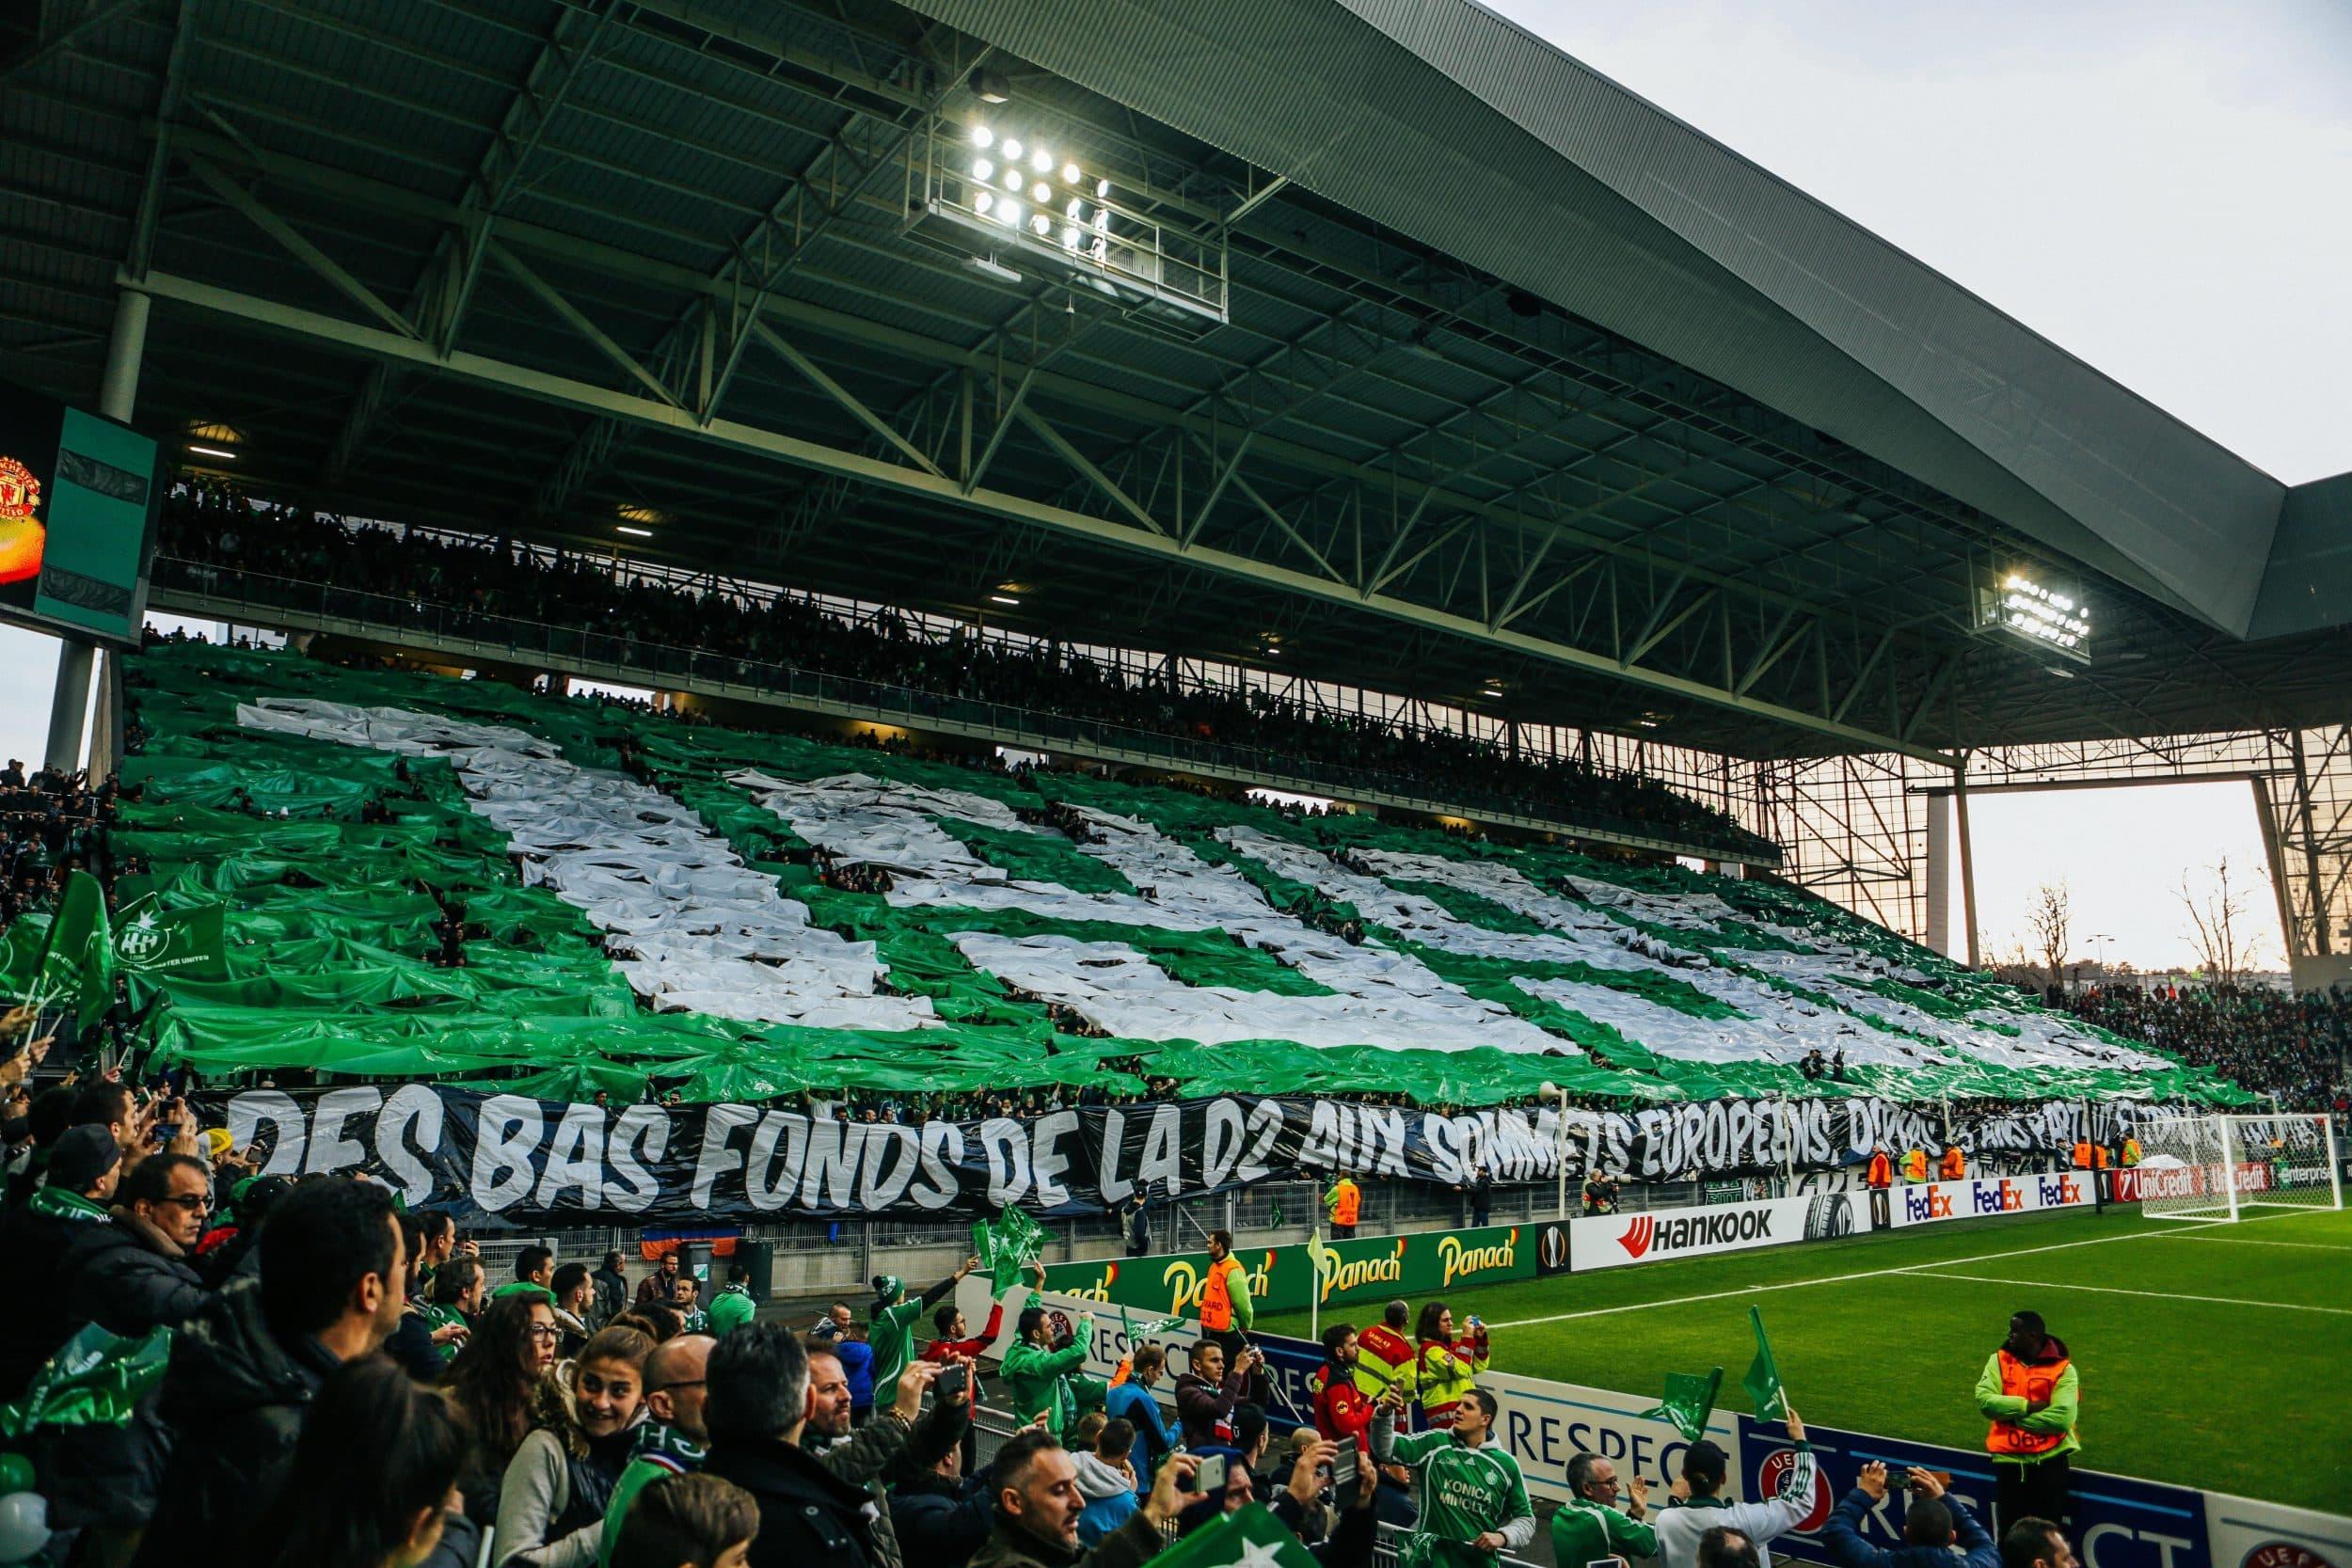 au-stade-geoffroy-guichard-asse-manchester-united-europa-league-6-min